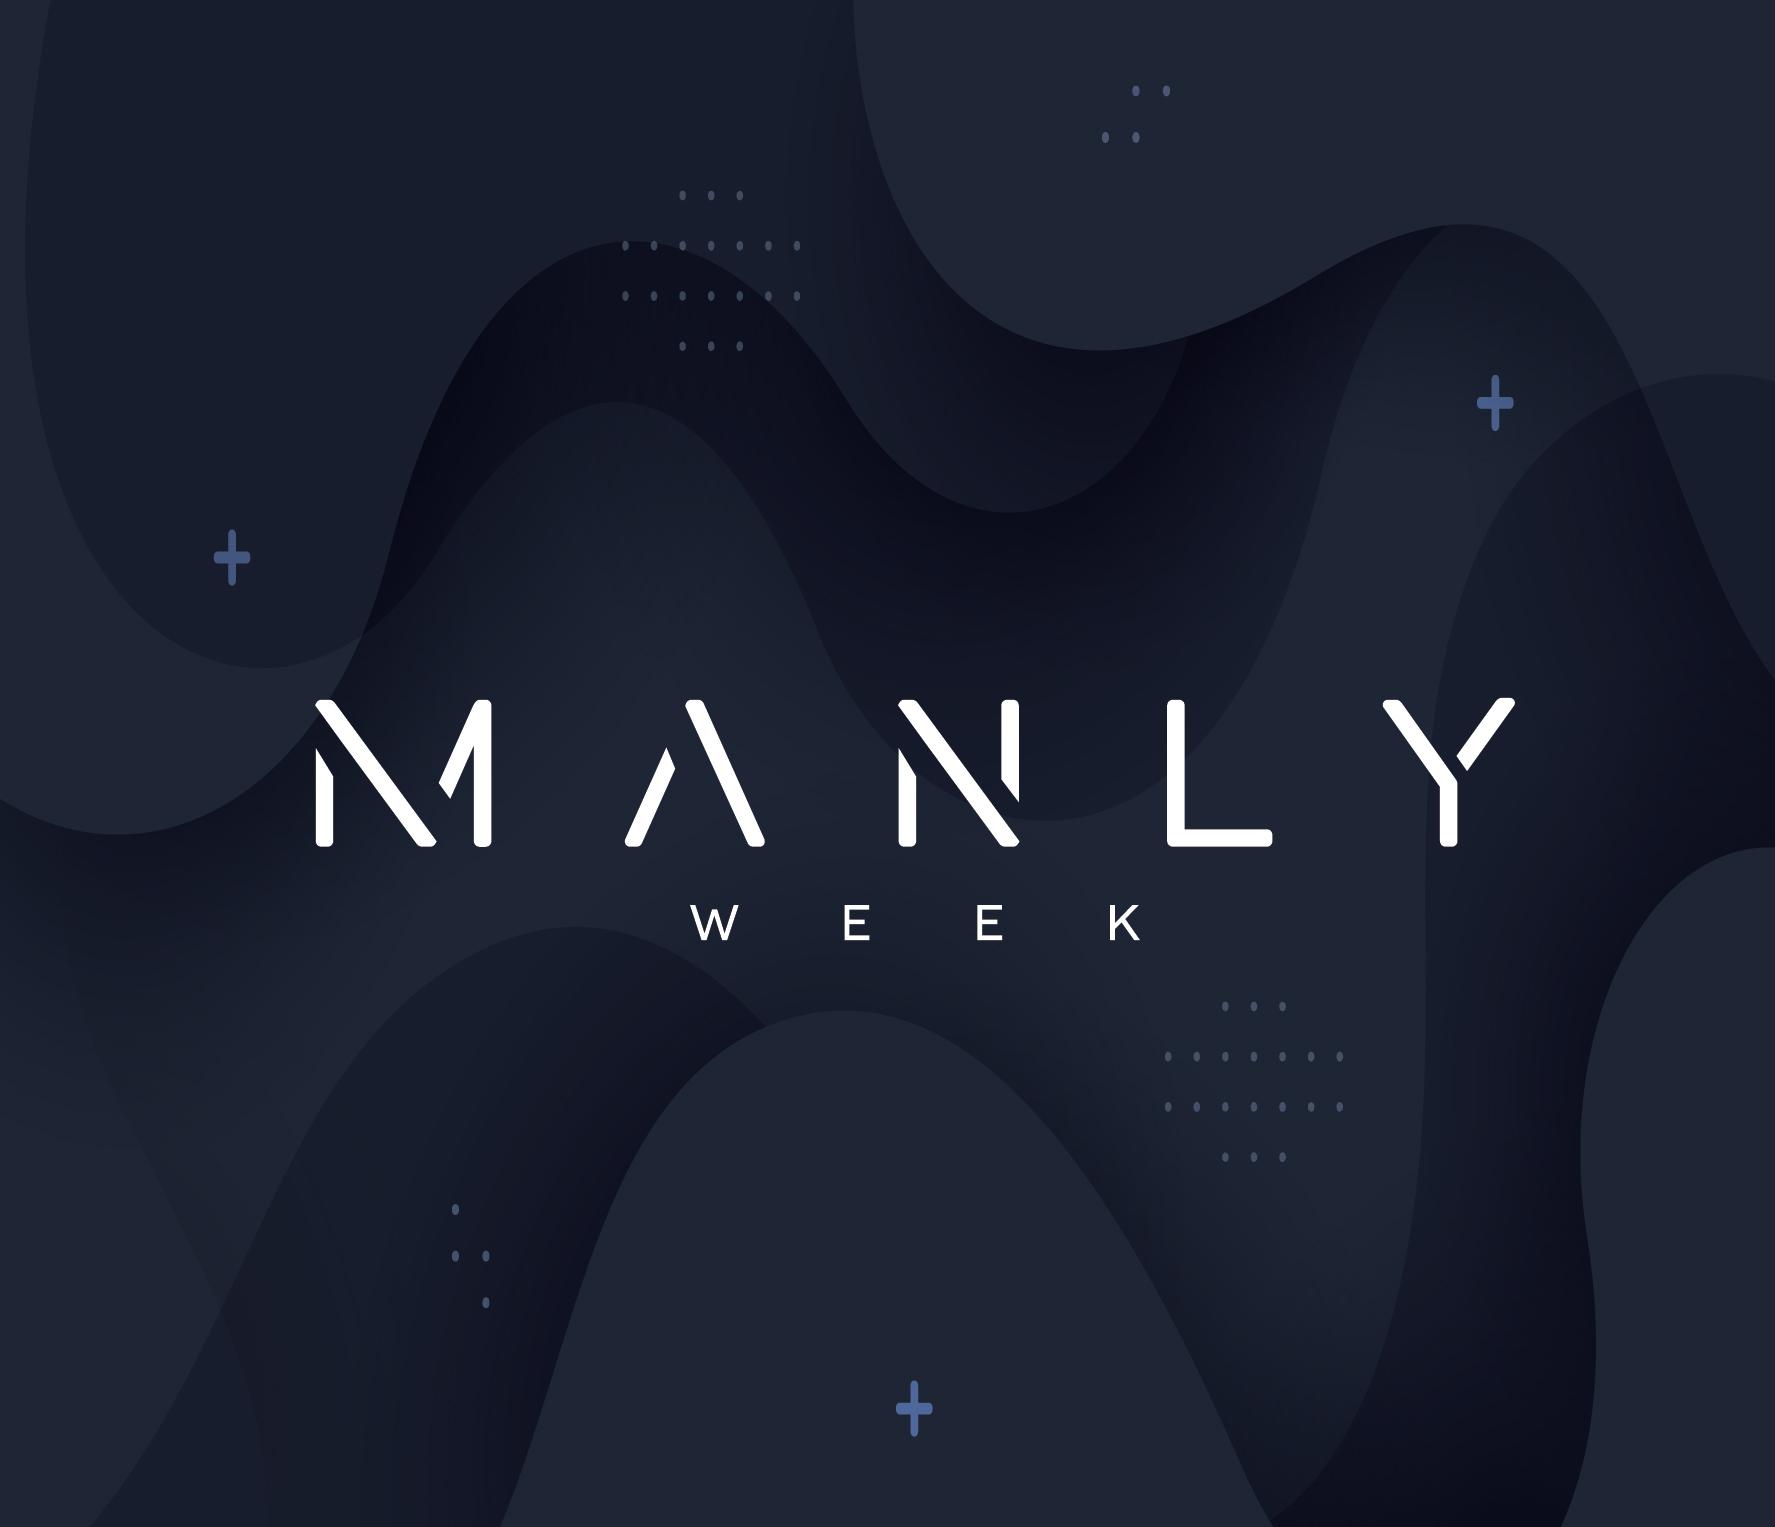 Manly Week